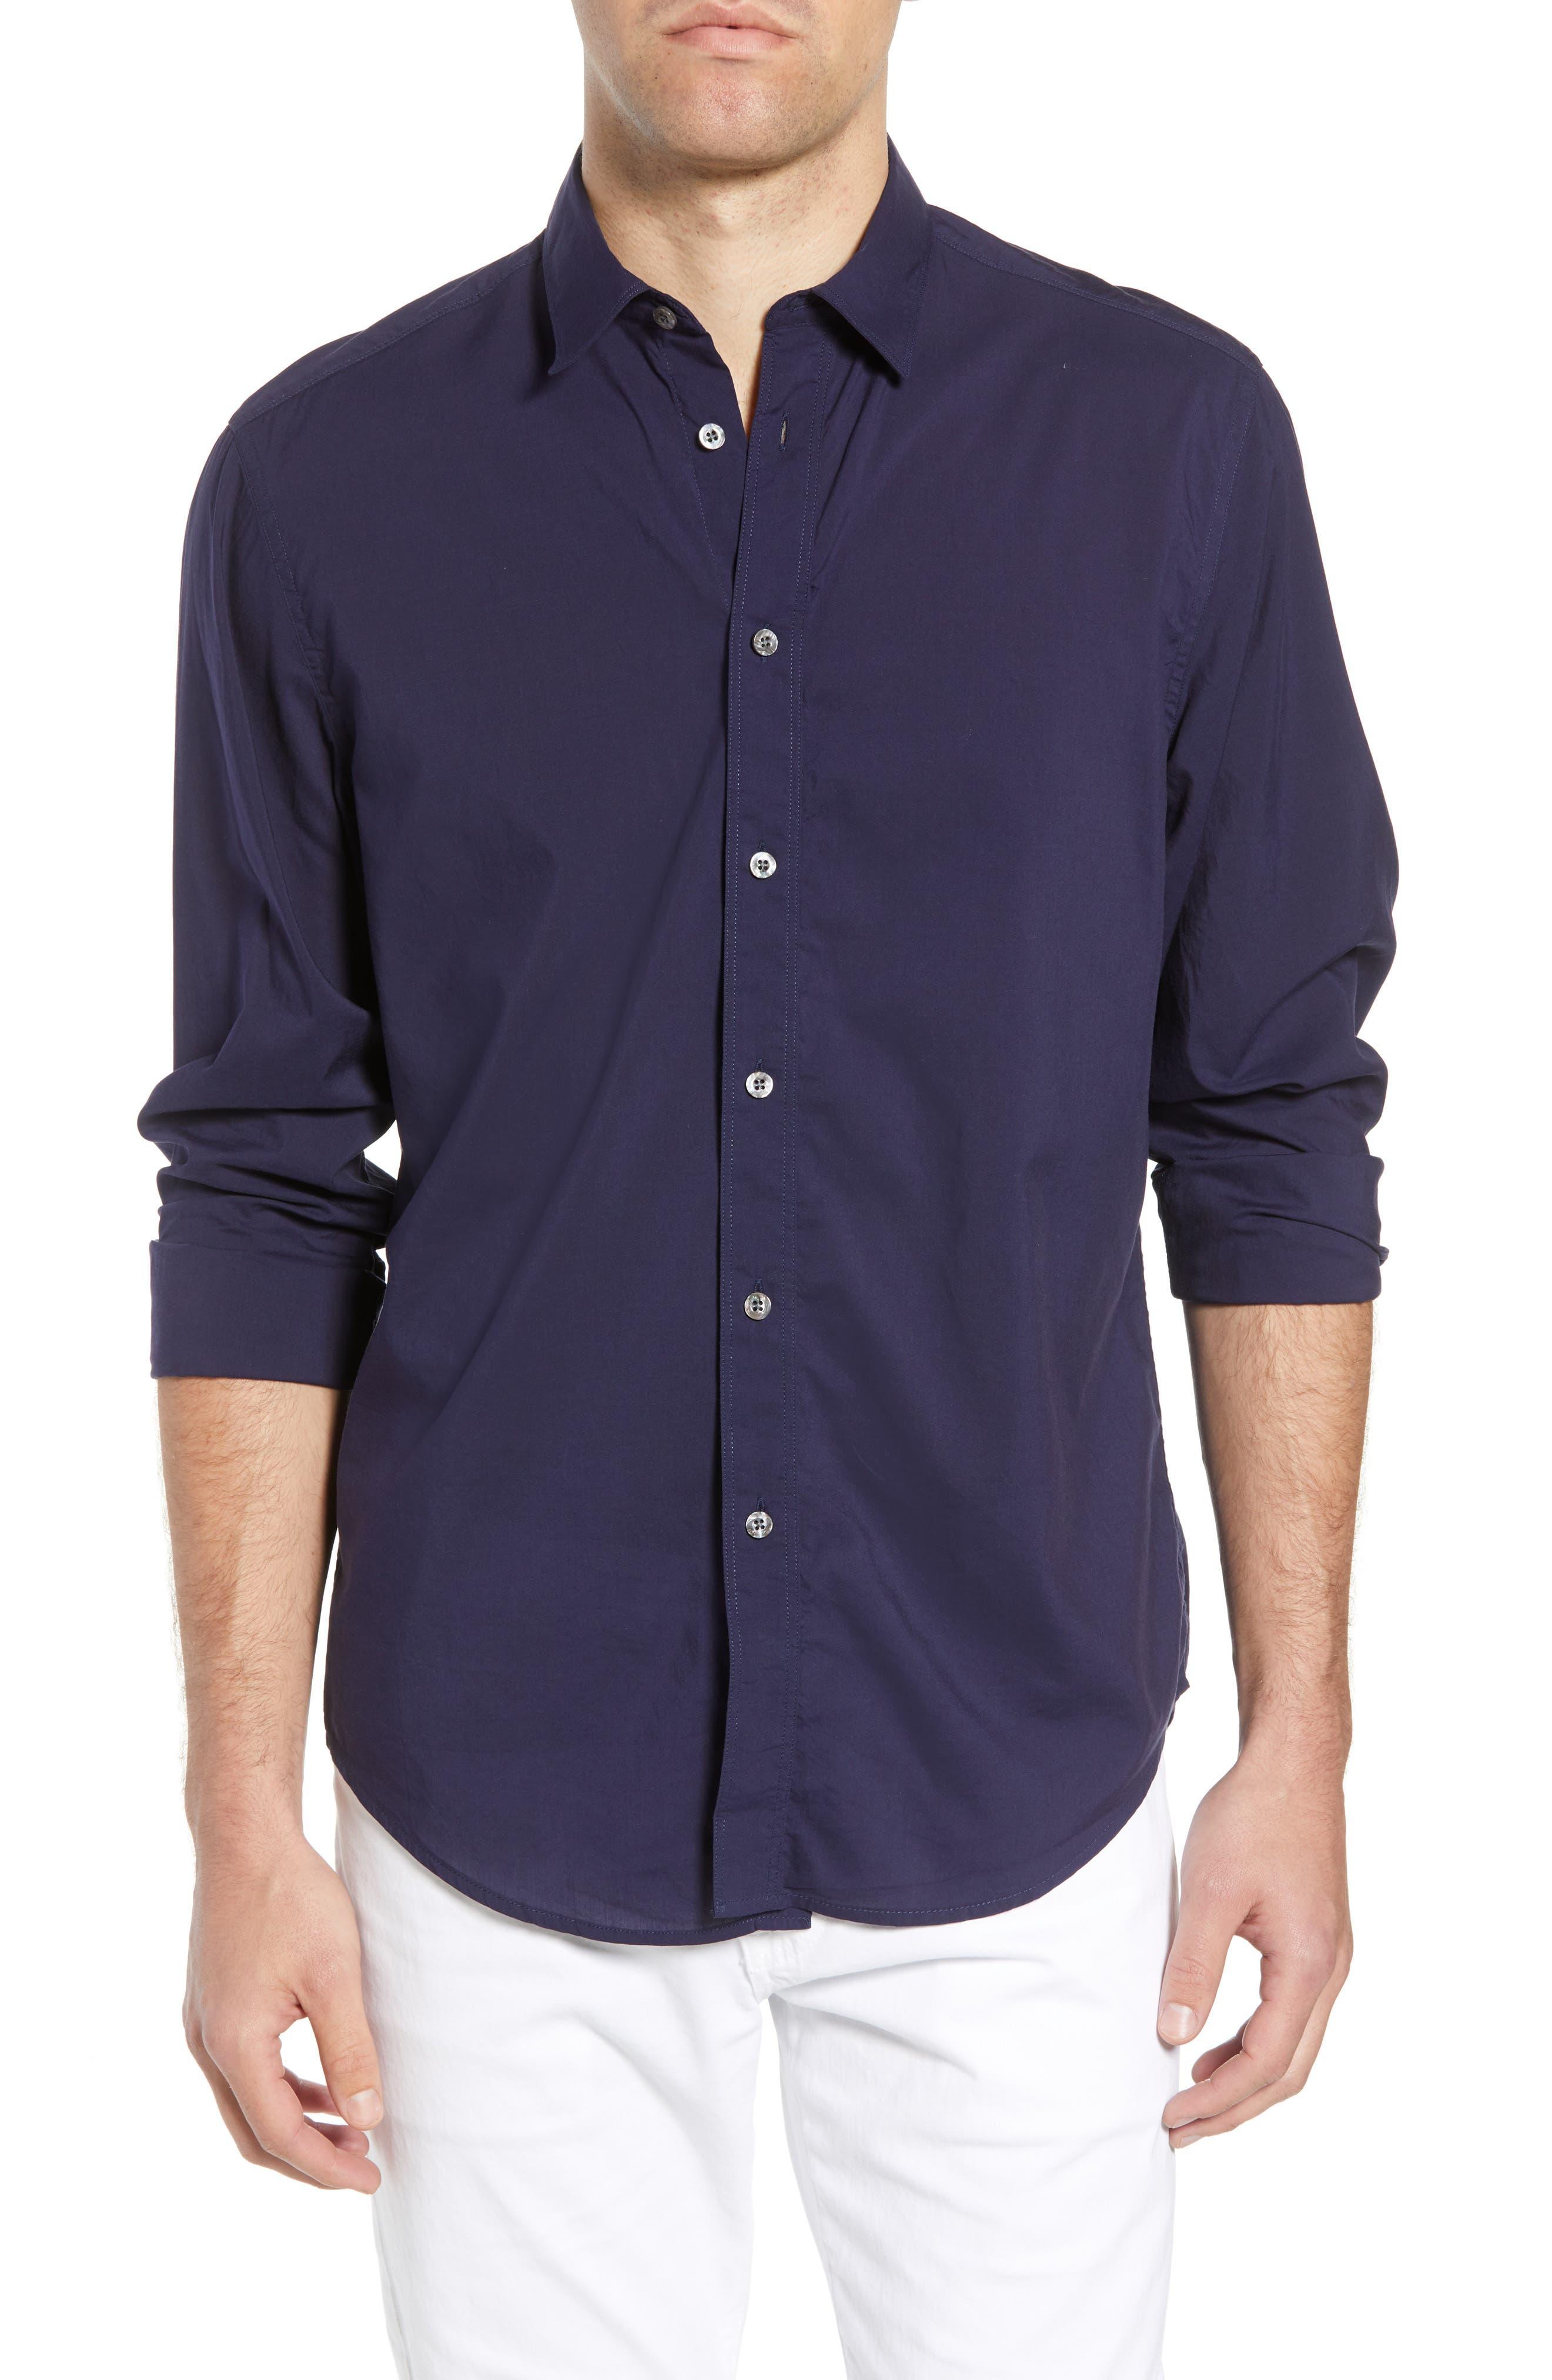 Pacifica Regular Fit Solid Sport Shirt,                             Main thumbnail 1, color,                             410